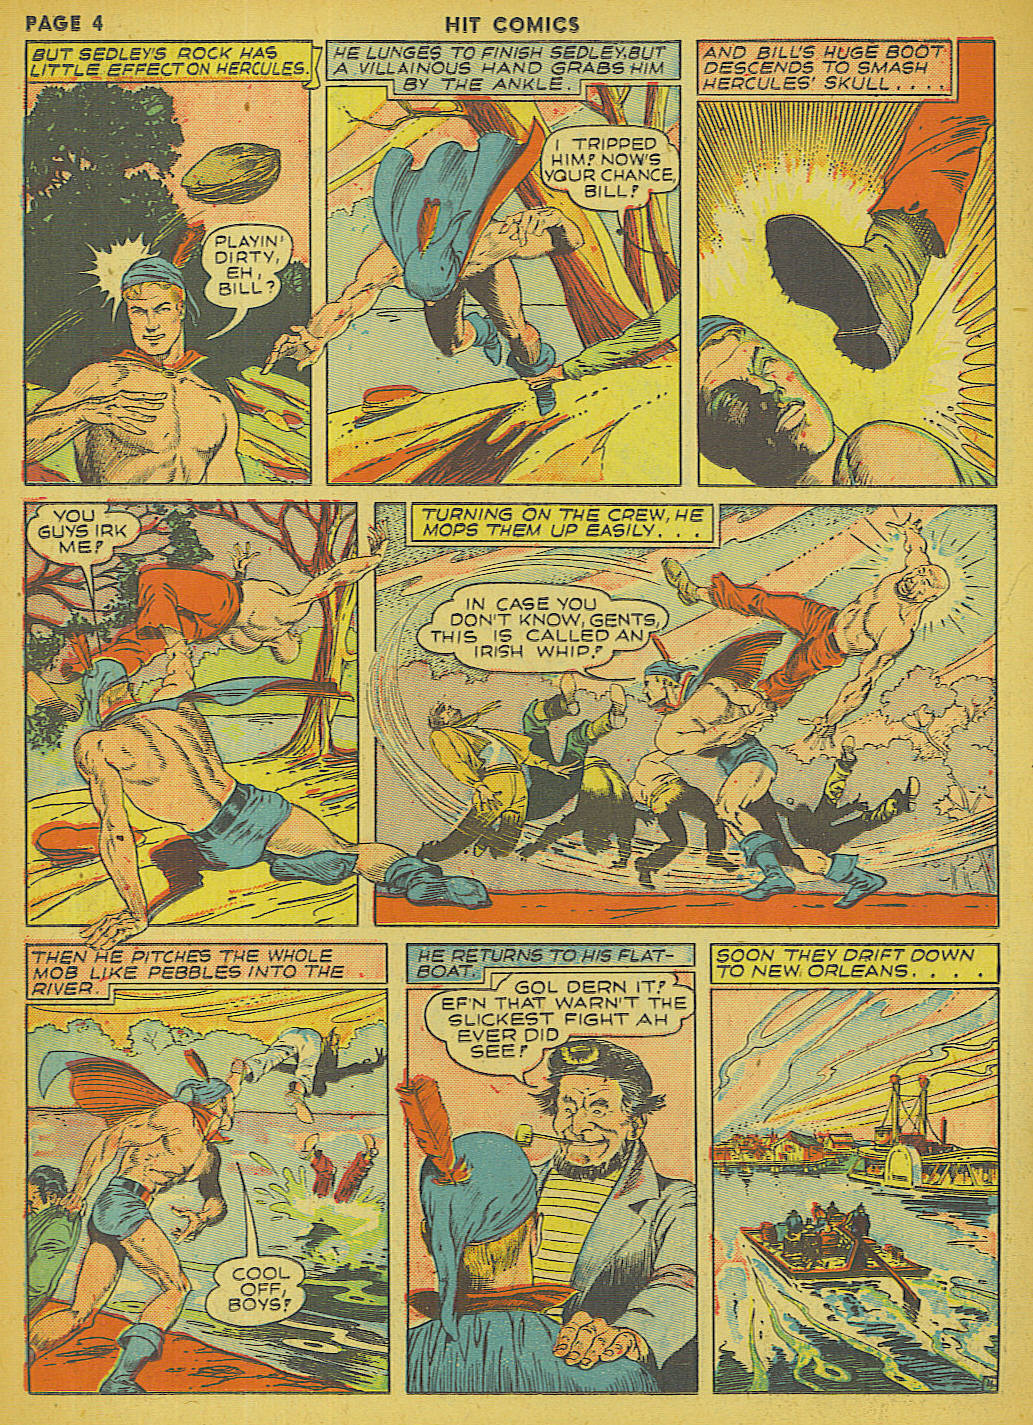 Read online Hit Comics comic -  Issue #13 - 6